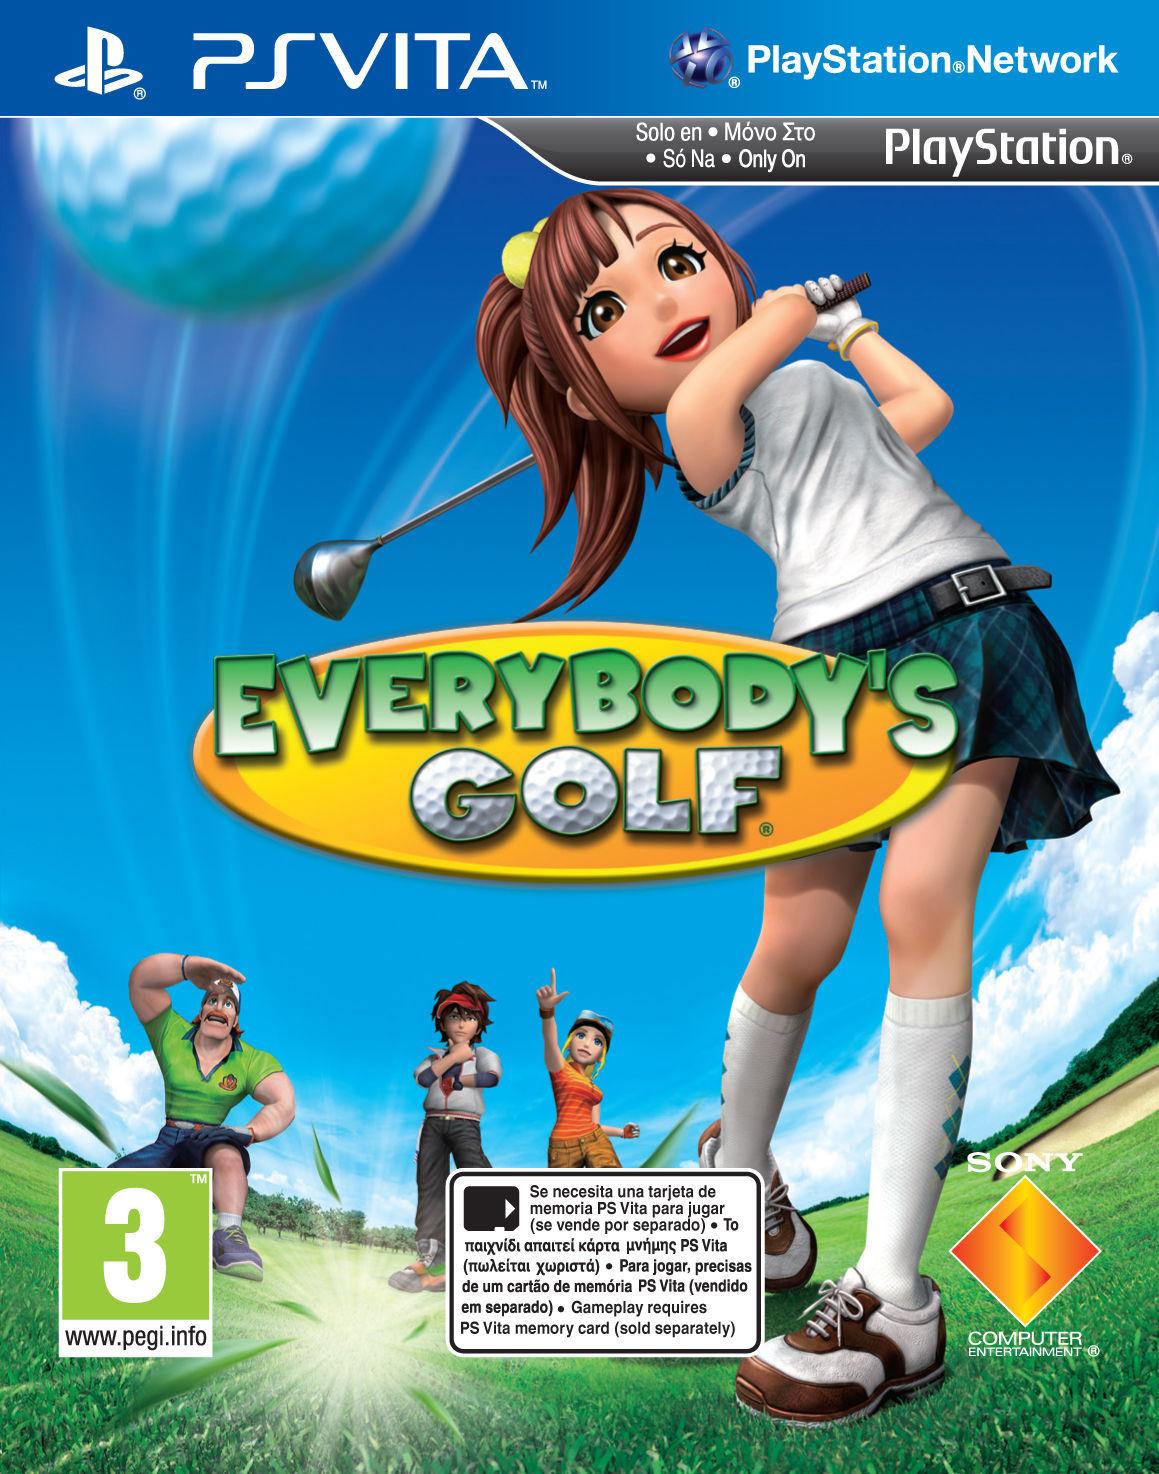 Imagen 17 de Everybody's Golf para PSVITA